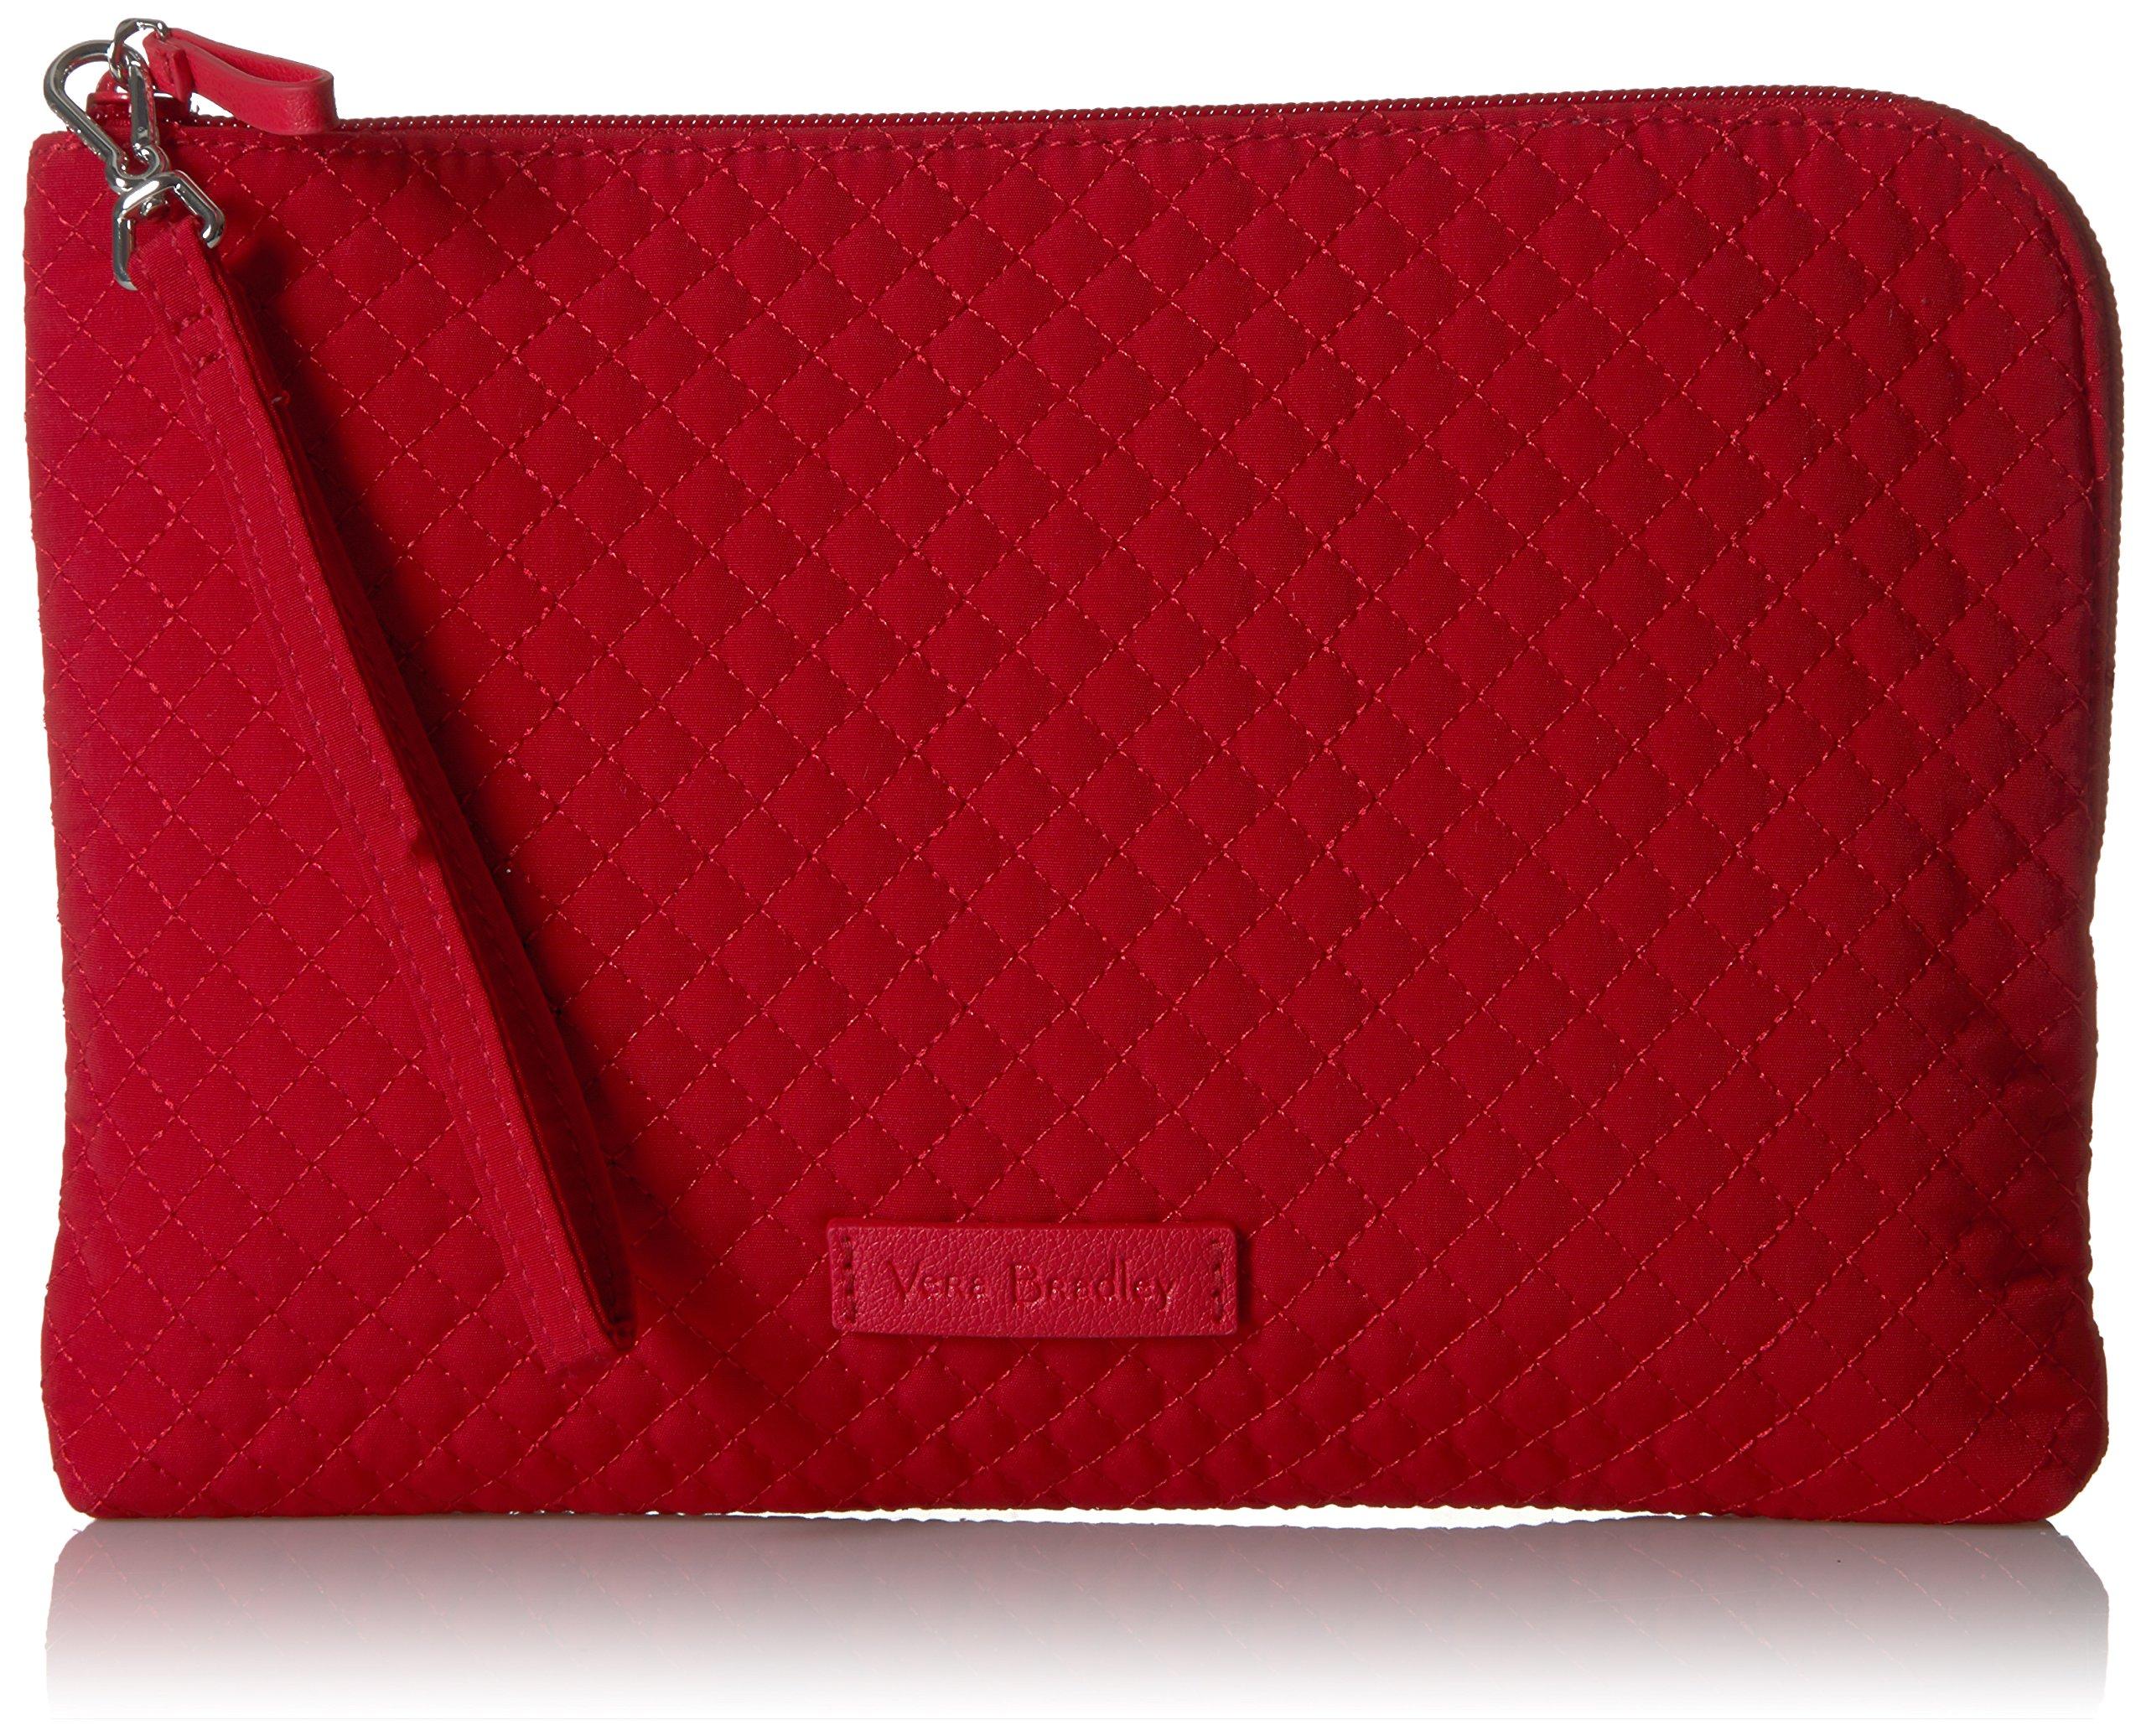 Vera Bradley Iconic Rfid Wristlet Vera, Cardinal Red